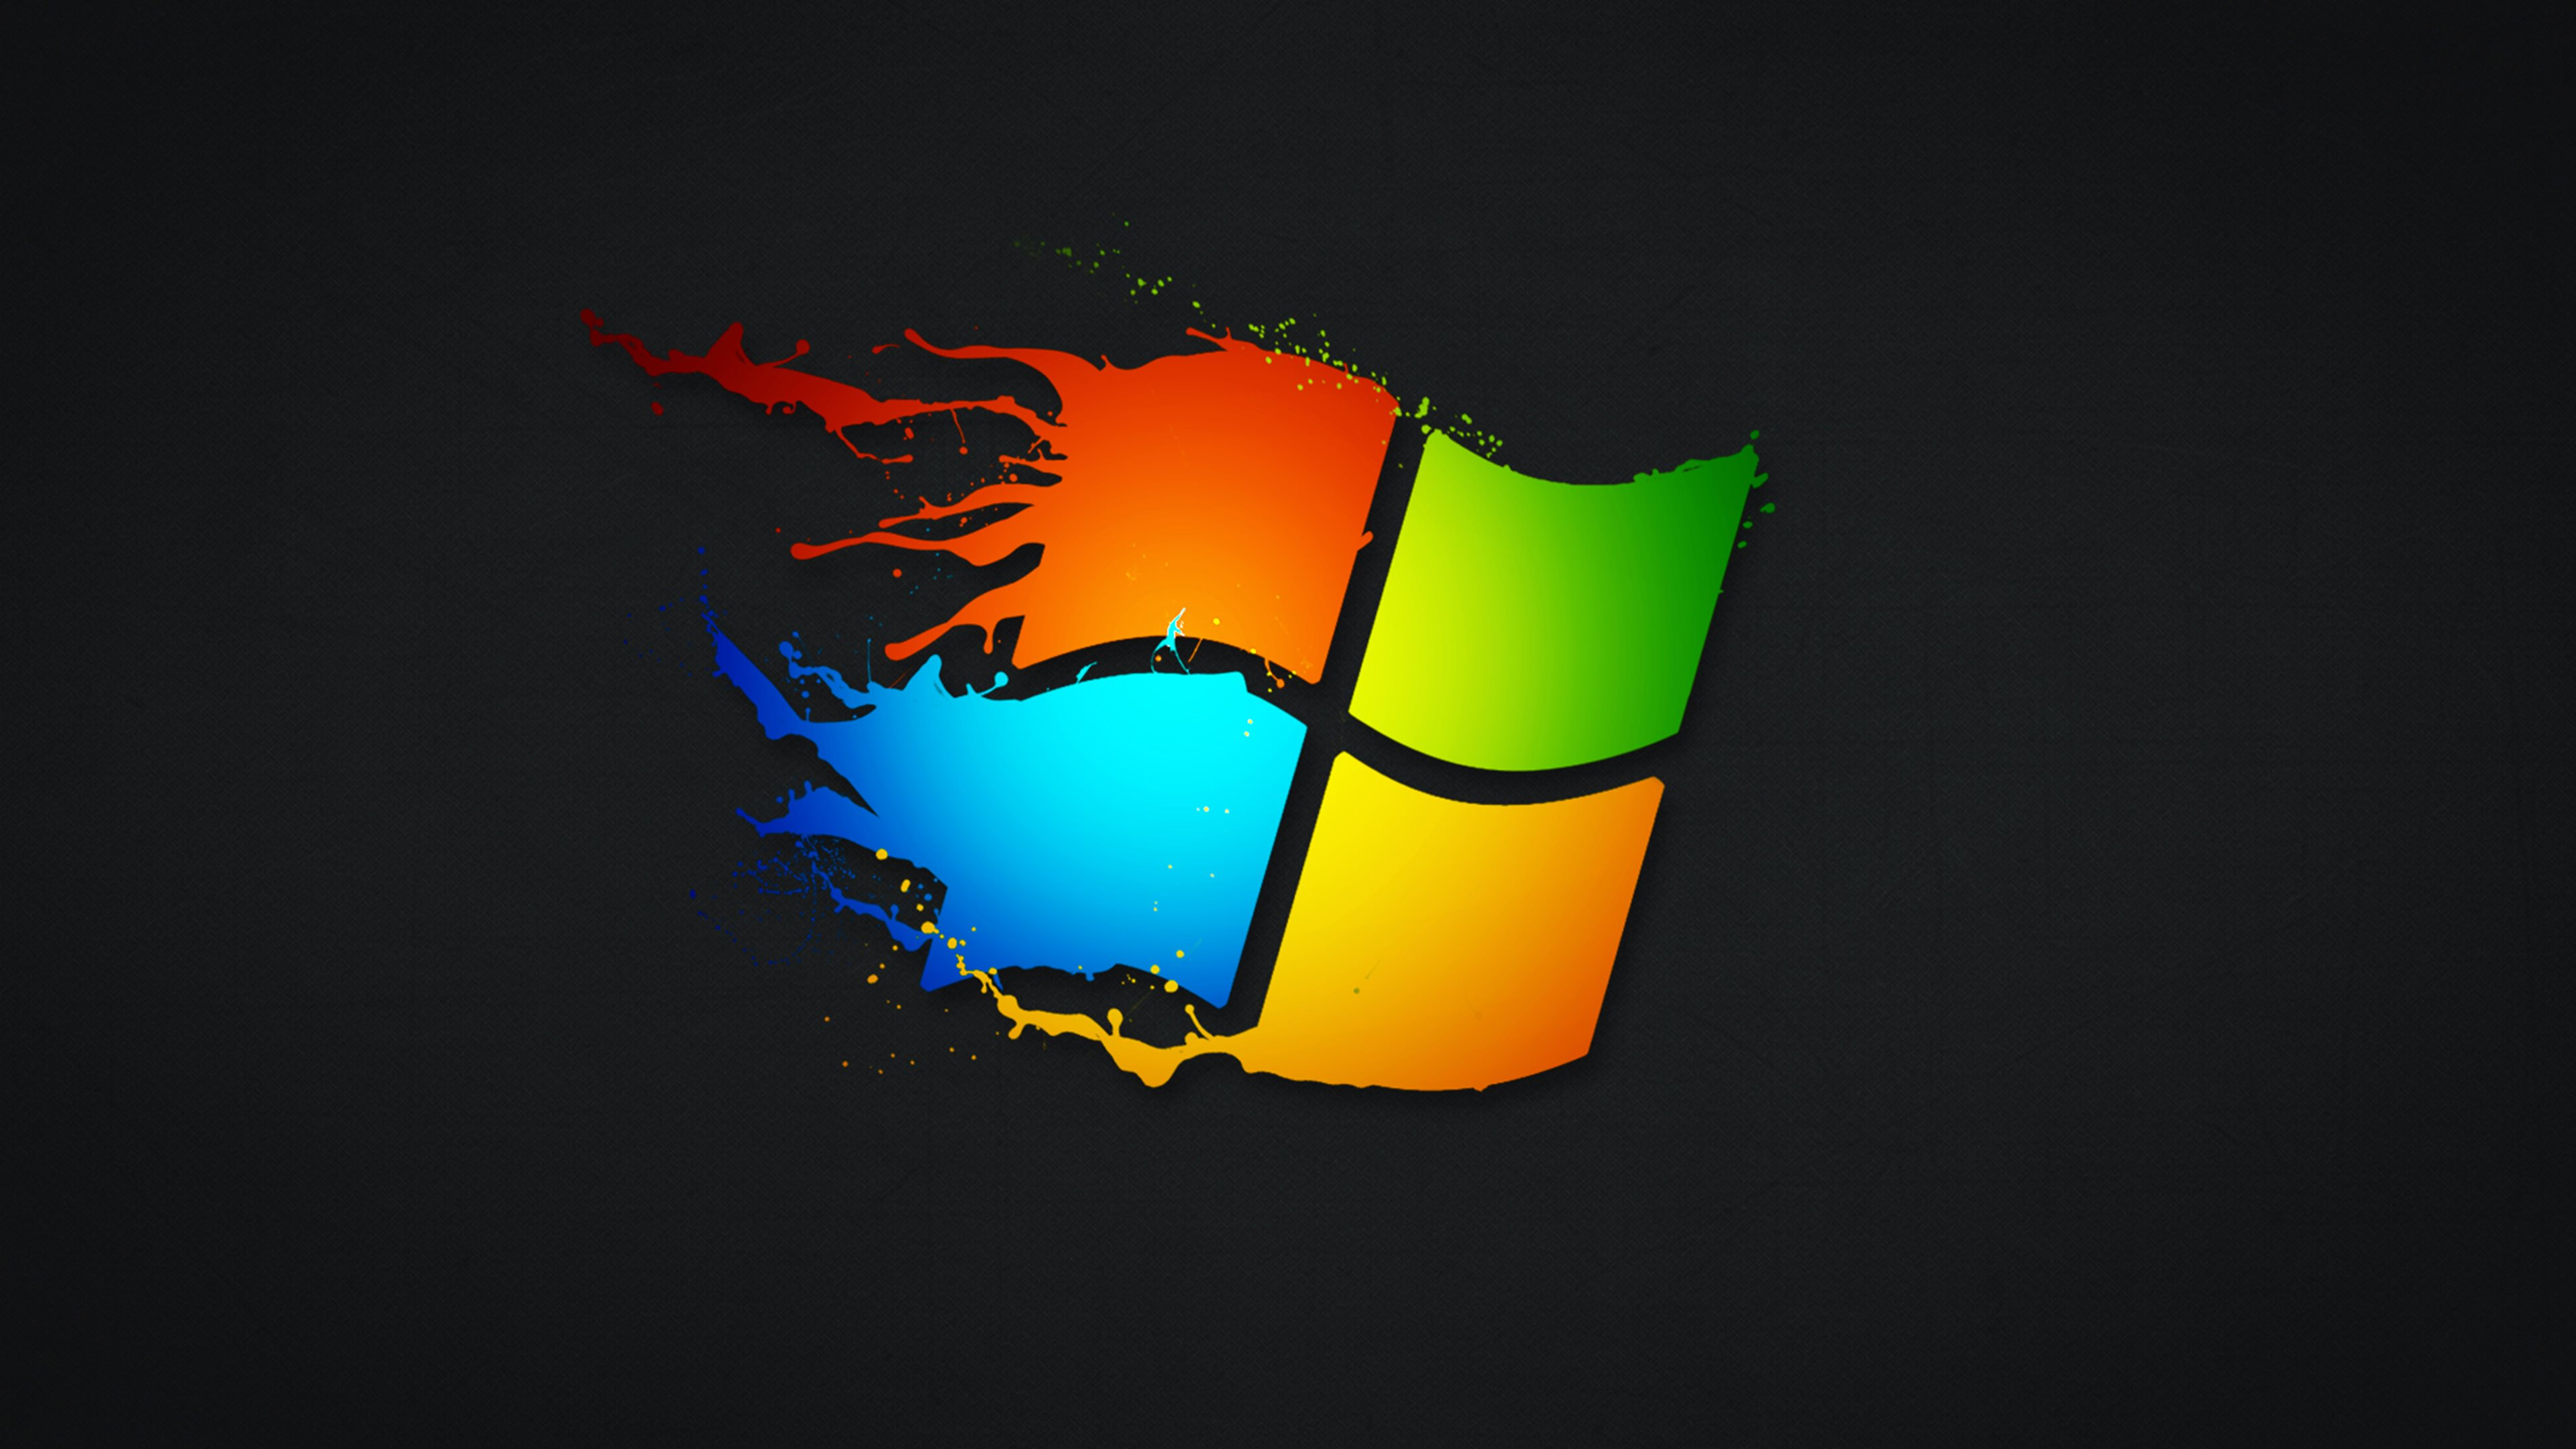 Windows Logo 4k Ultra HD Wallpaper Background Image